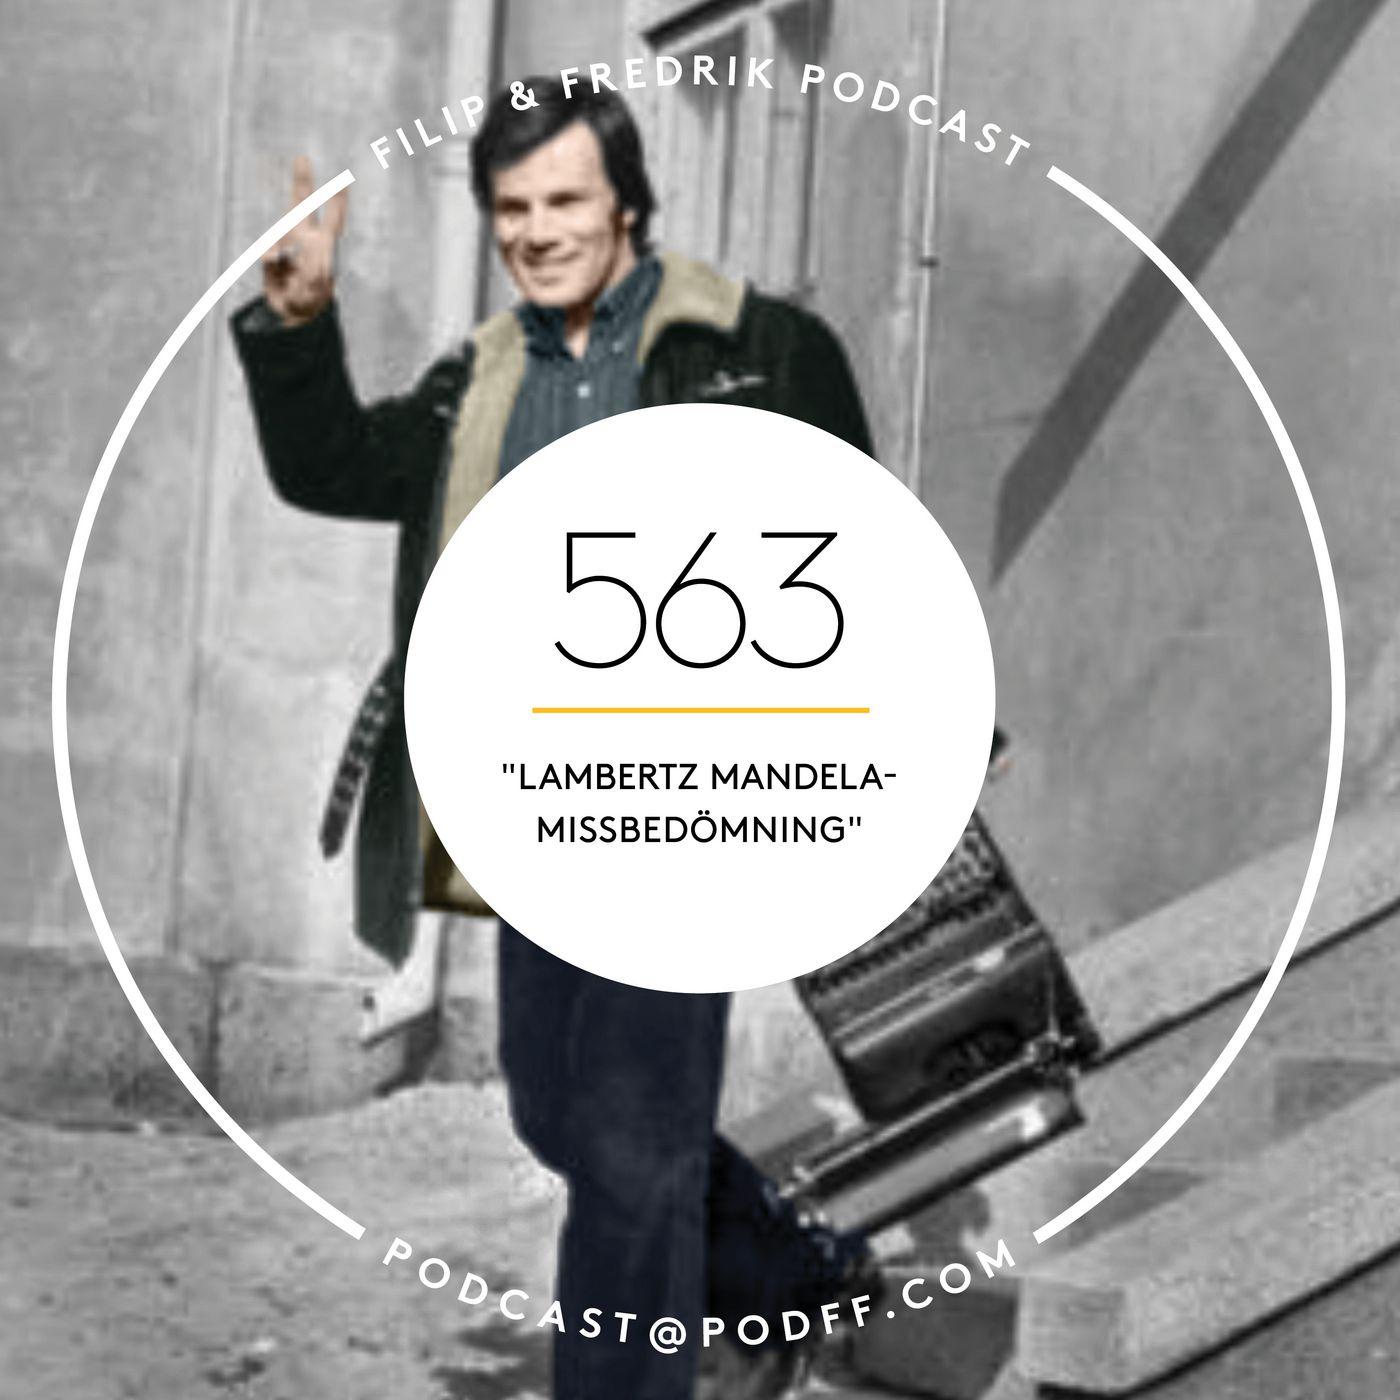 "563. ""Lambertz Mandela-missbedömning"""